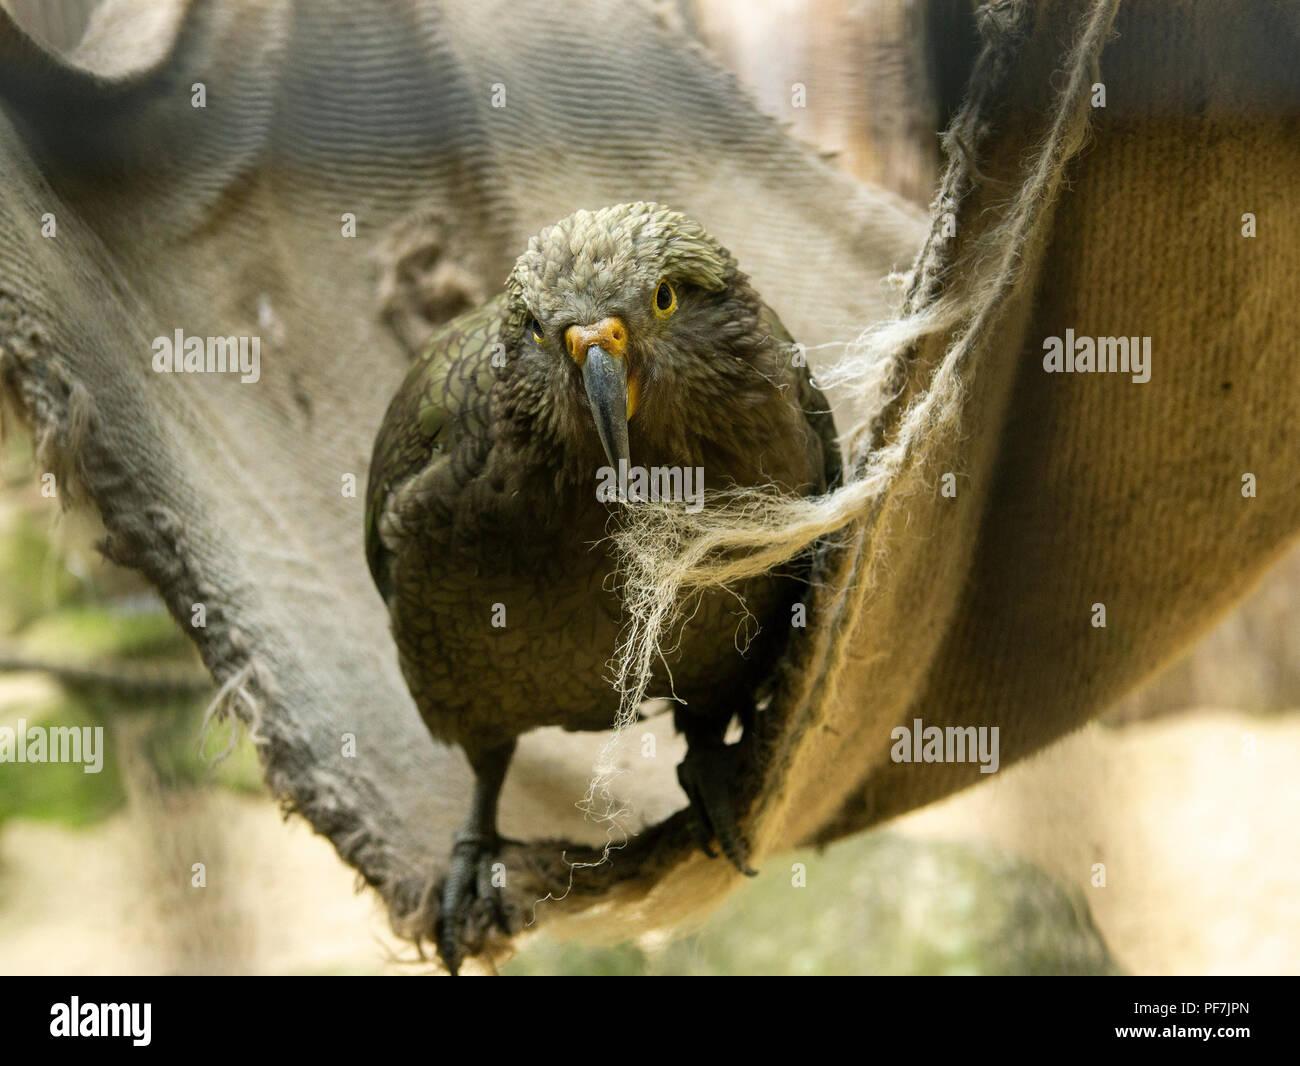 A bird with a sharp beak sits on a hammock. - Stock Image